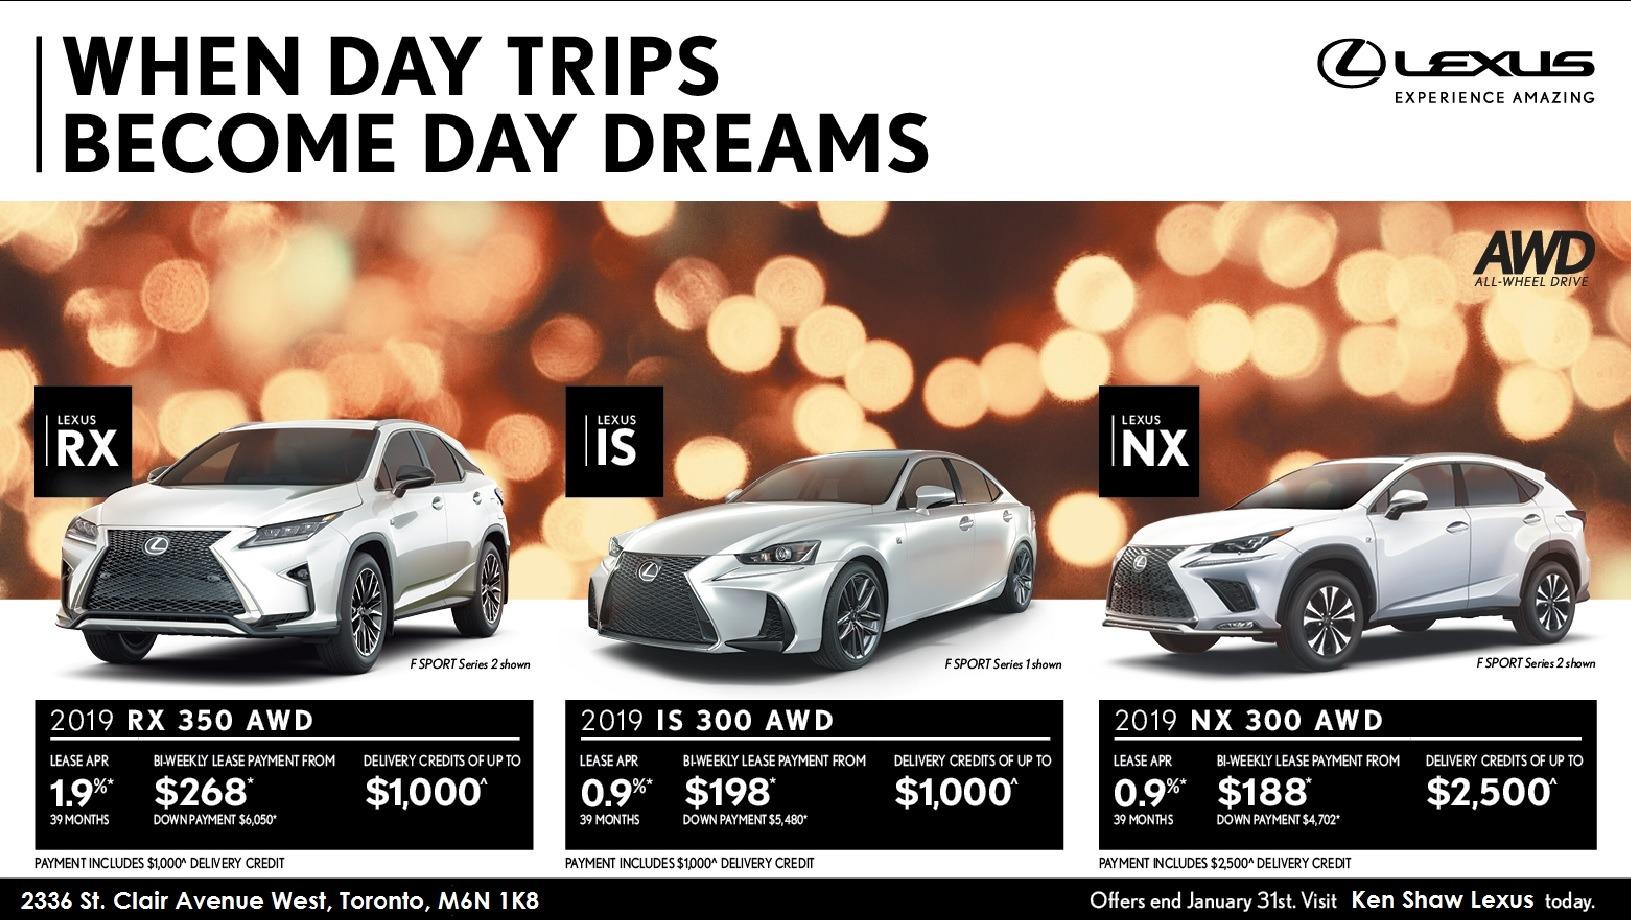 ken shaw lexus January offer new lexus vehicle promotion